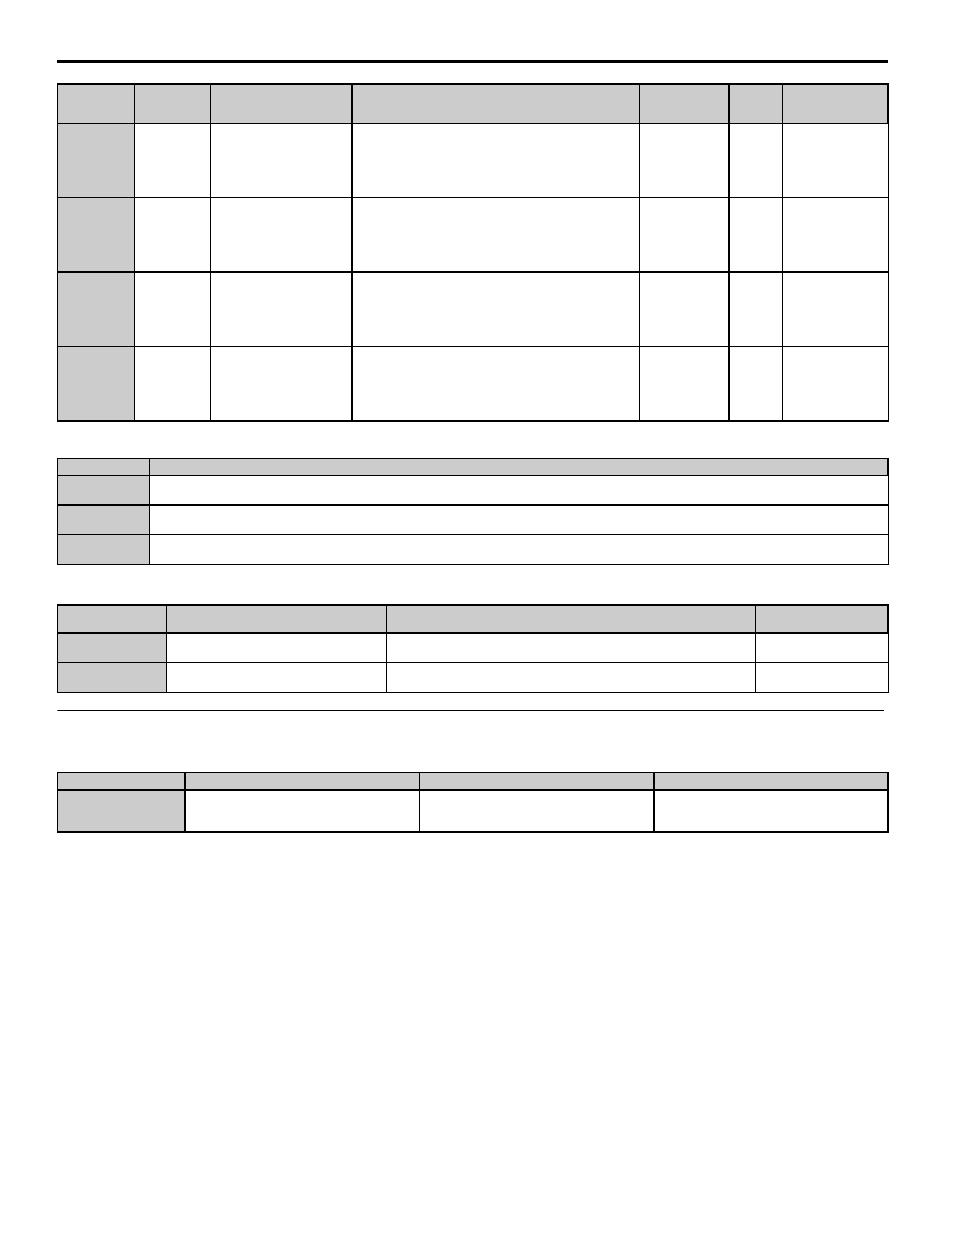 Yaskawa A1000 Manual Pdf